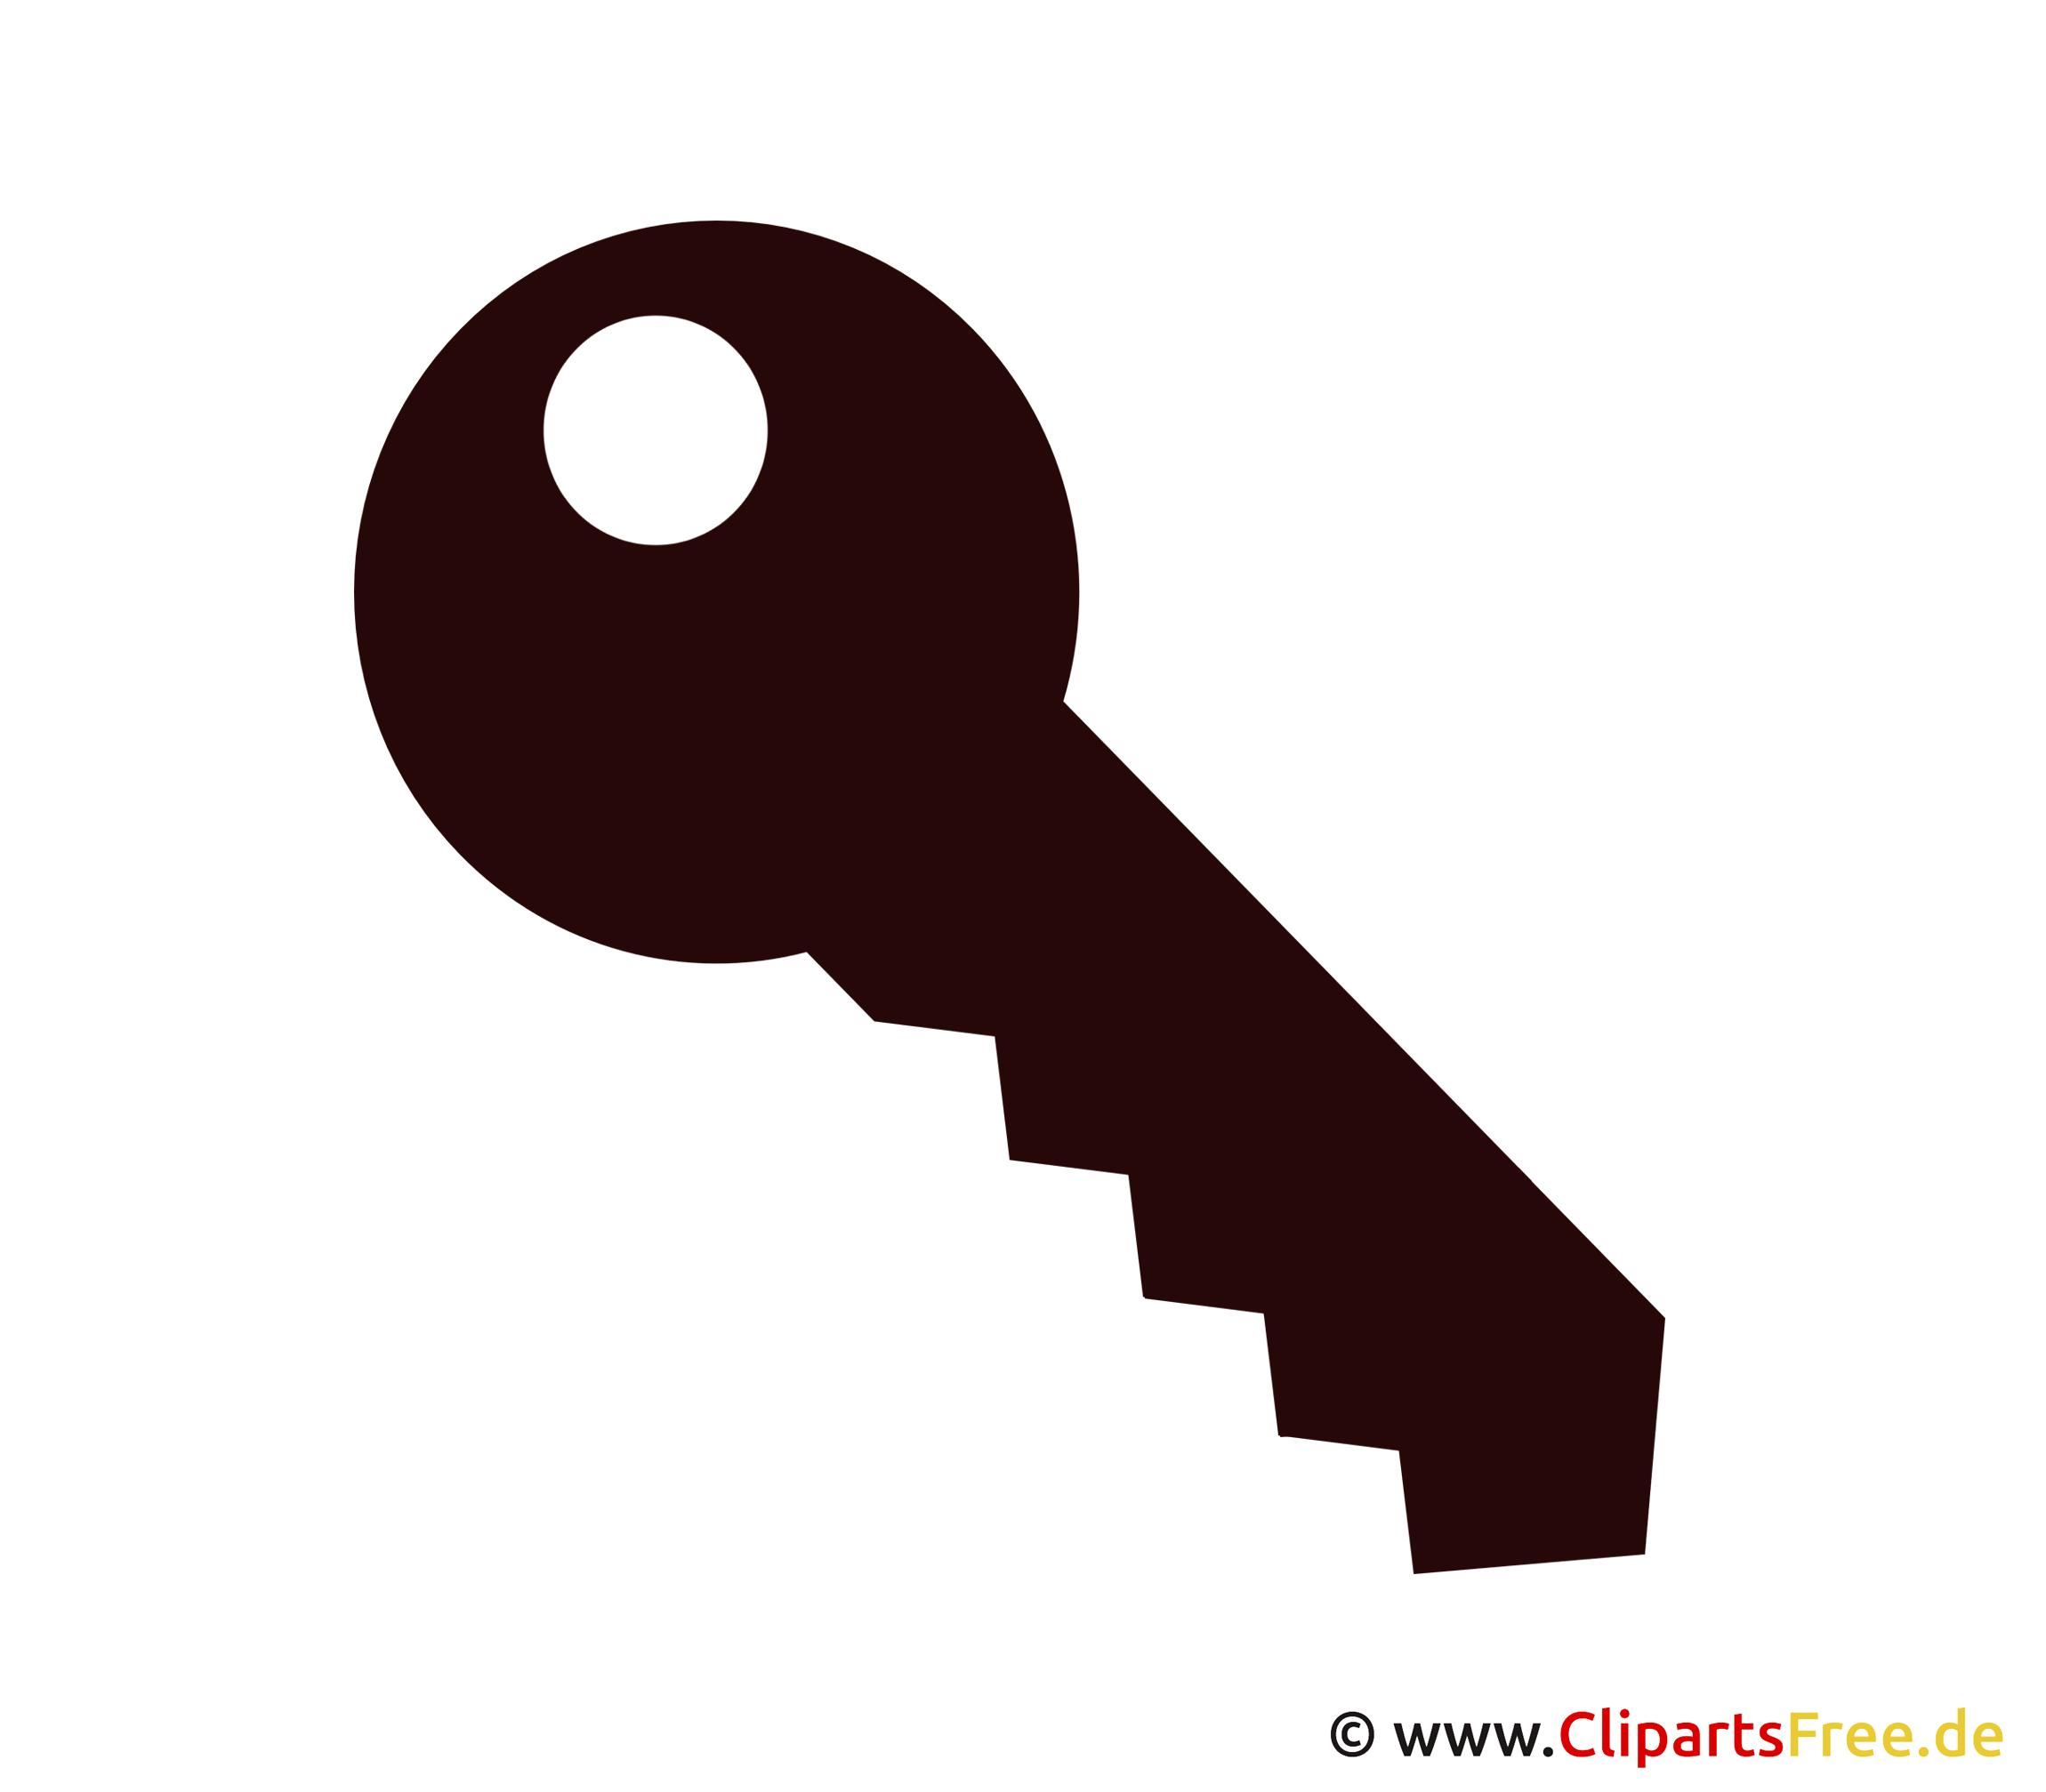 Schlüssel Clip Art, Bild, Illustration free